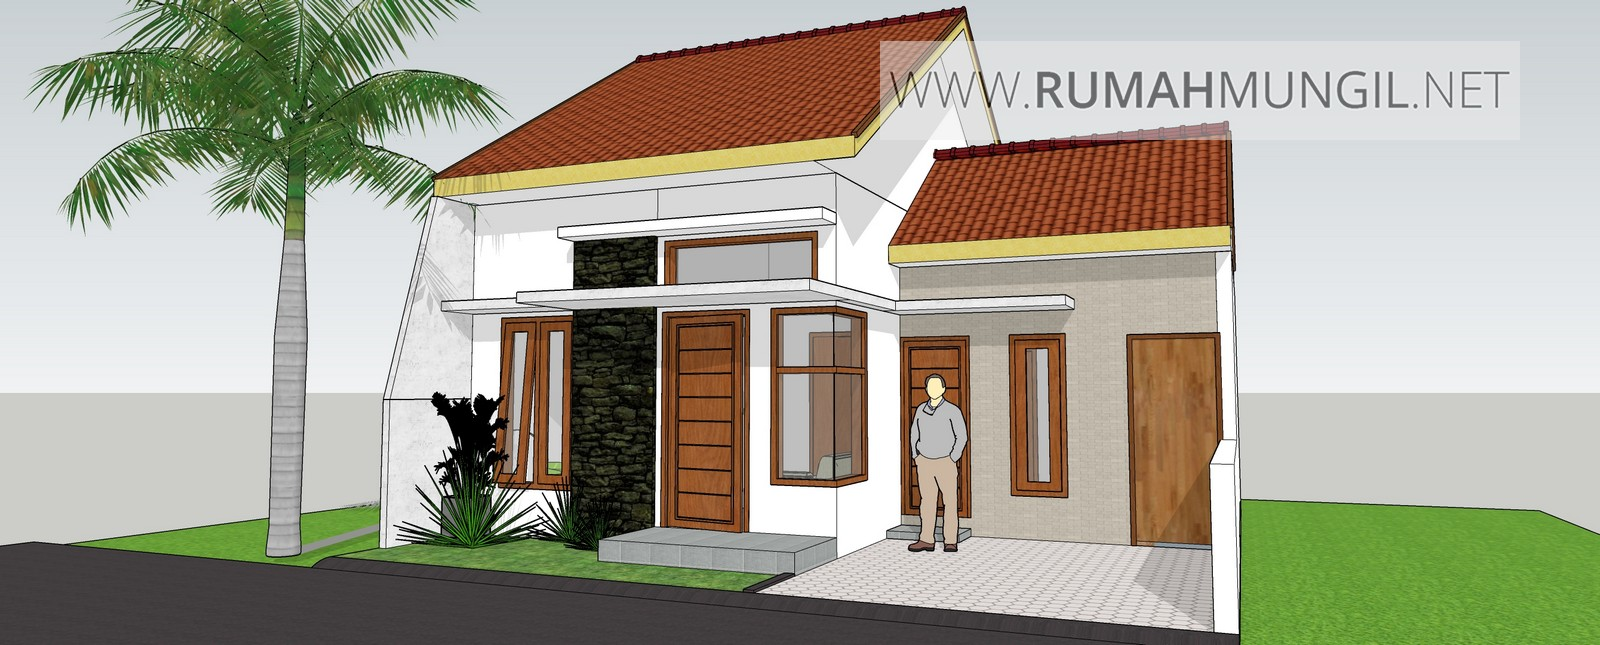 Kumpulan Model Desain Rumah Minimalis Rumah Modern Rumah Sederhana Rumah Impian Rumah & Model Rumah Mungil 7x8m Sederhana - RumahMungil.net